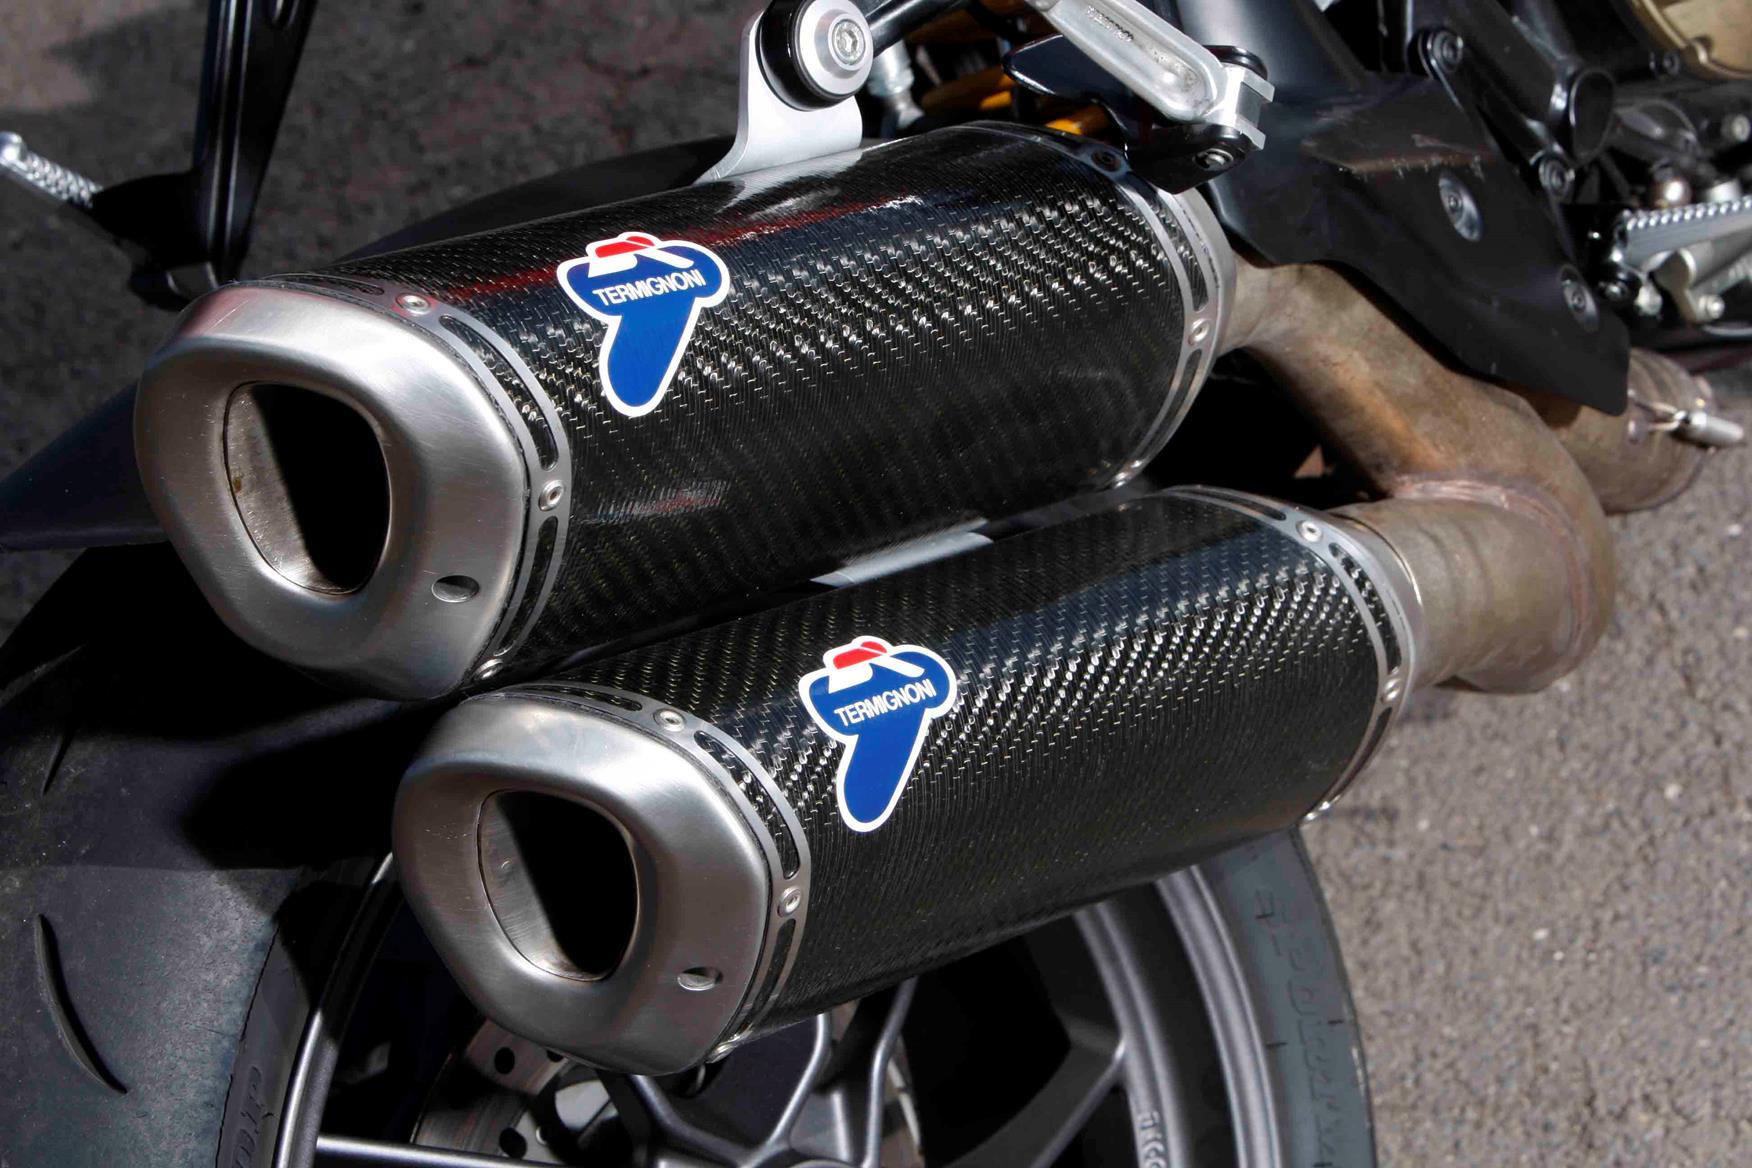 Termignoni Cans On A Ducati Streetfighter